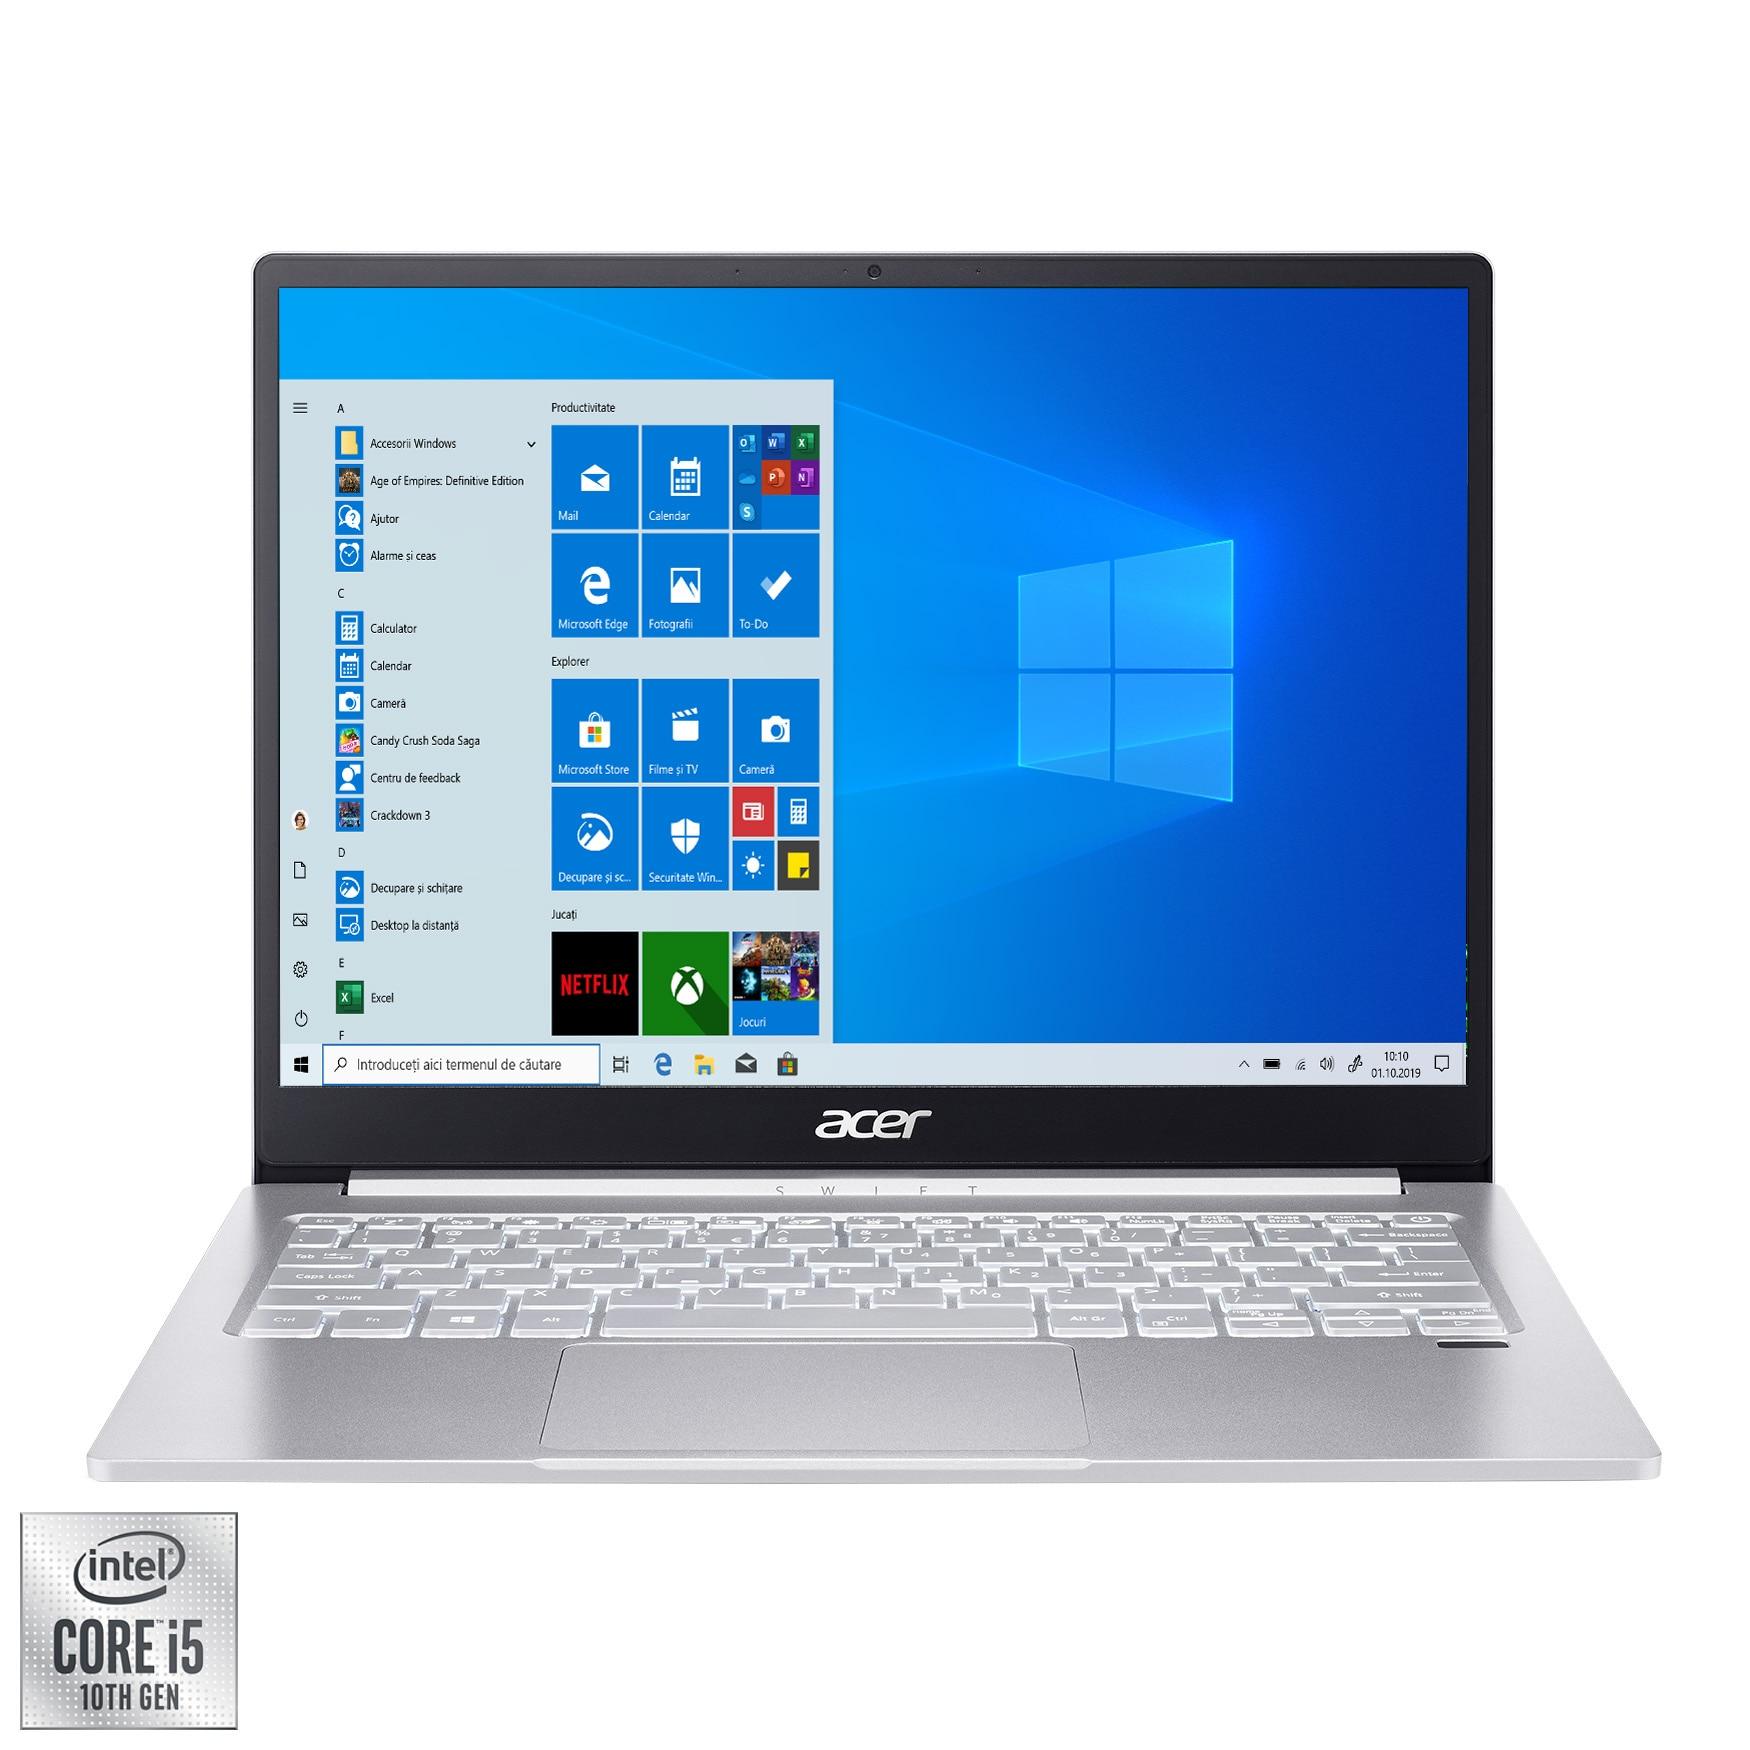 "Fotografie Laptop ultraportabil Acer Swift 3 SF313-52 cu procesor Intel® Core™ i5-1035G4 pana la 3.70 GHz, 13.5"", QHD, 8GB, 256GB SSD, Intel UHD Graphics, Windows 10 Pro, Silver"